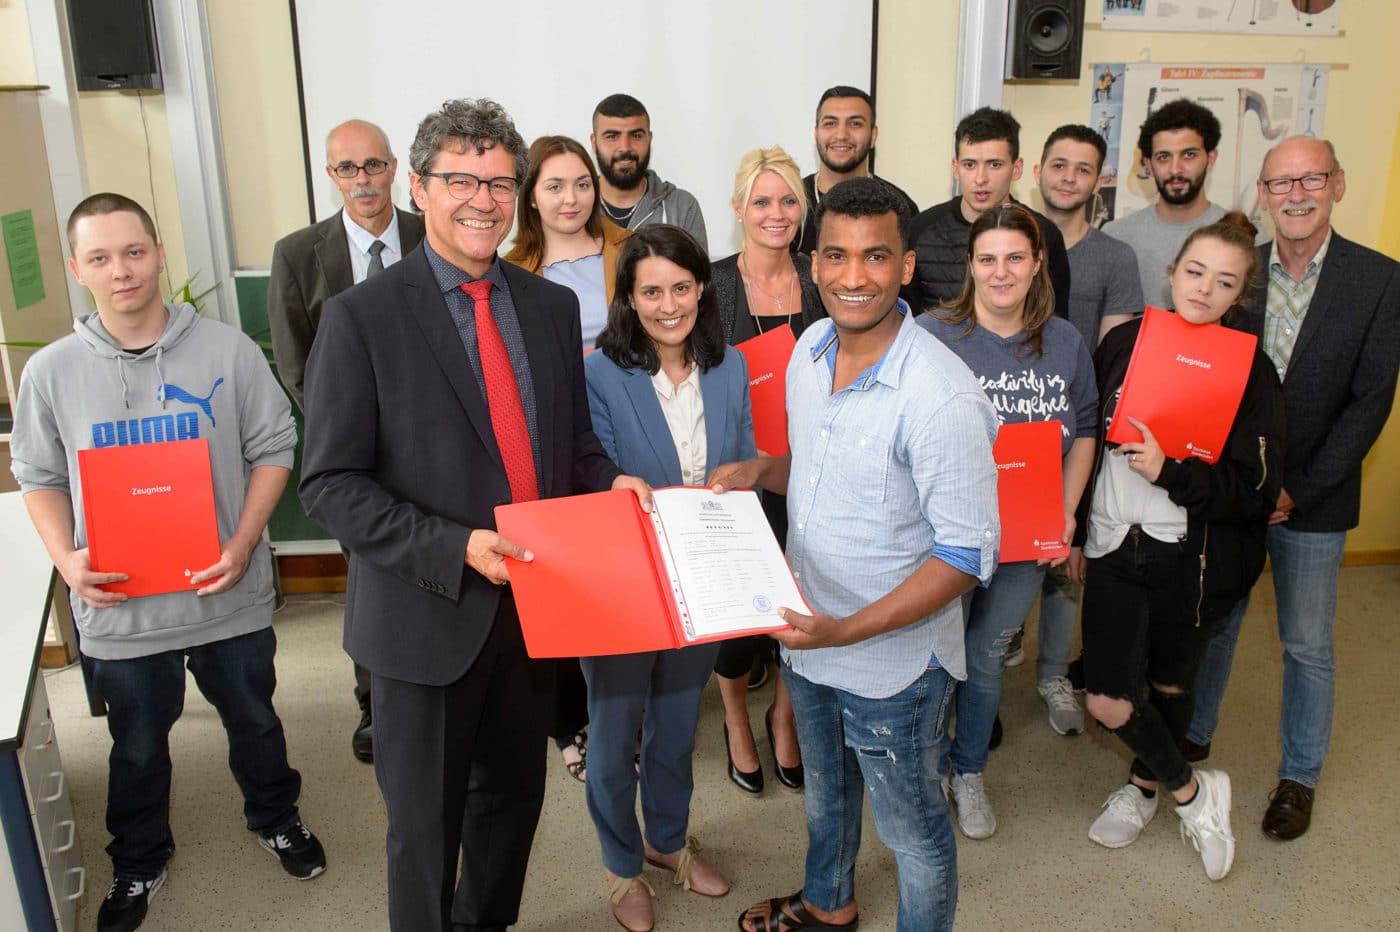 vhs Saarbrücken: 13 Teilnehmer erhalten Hauptschulabschluss